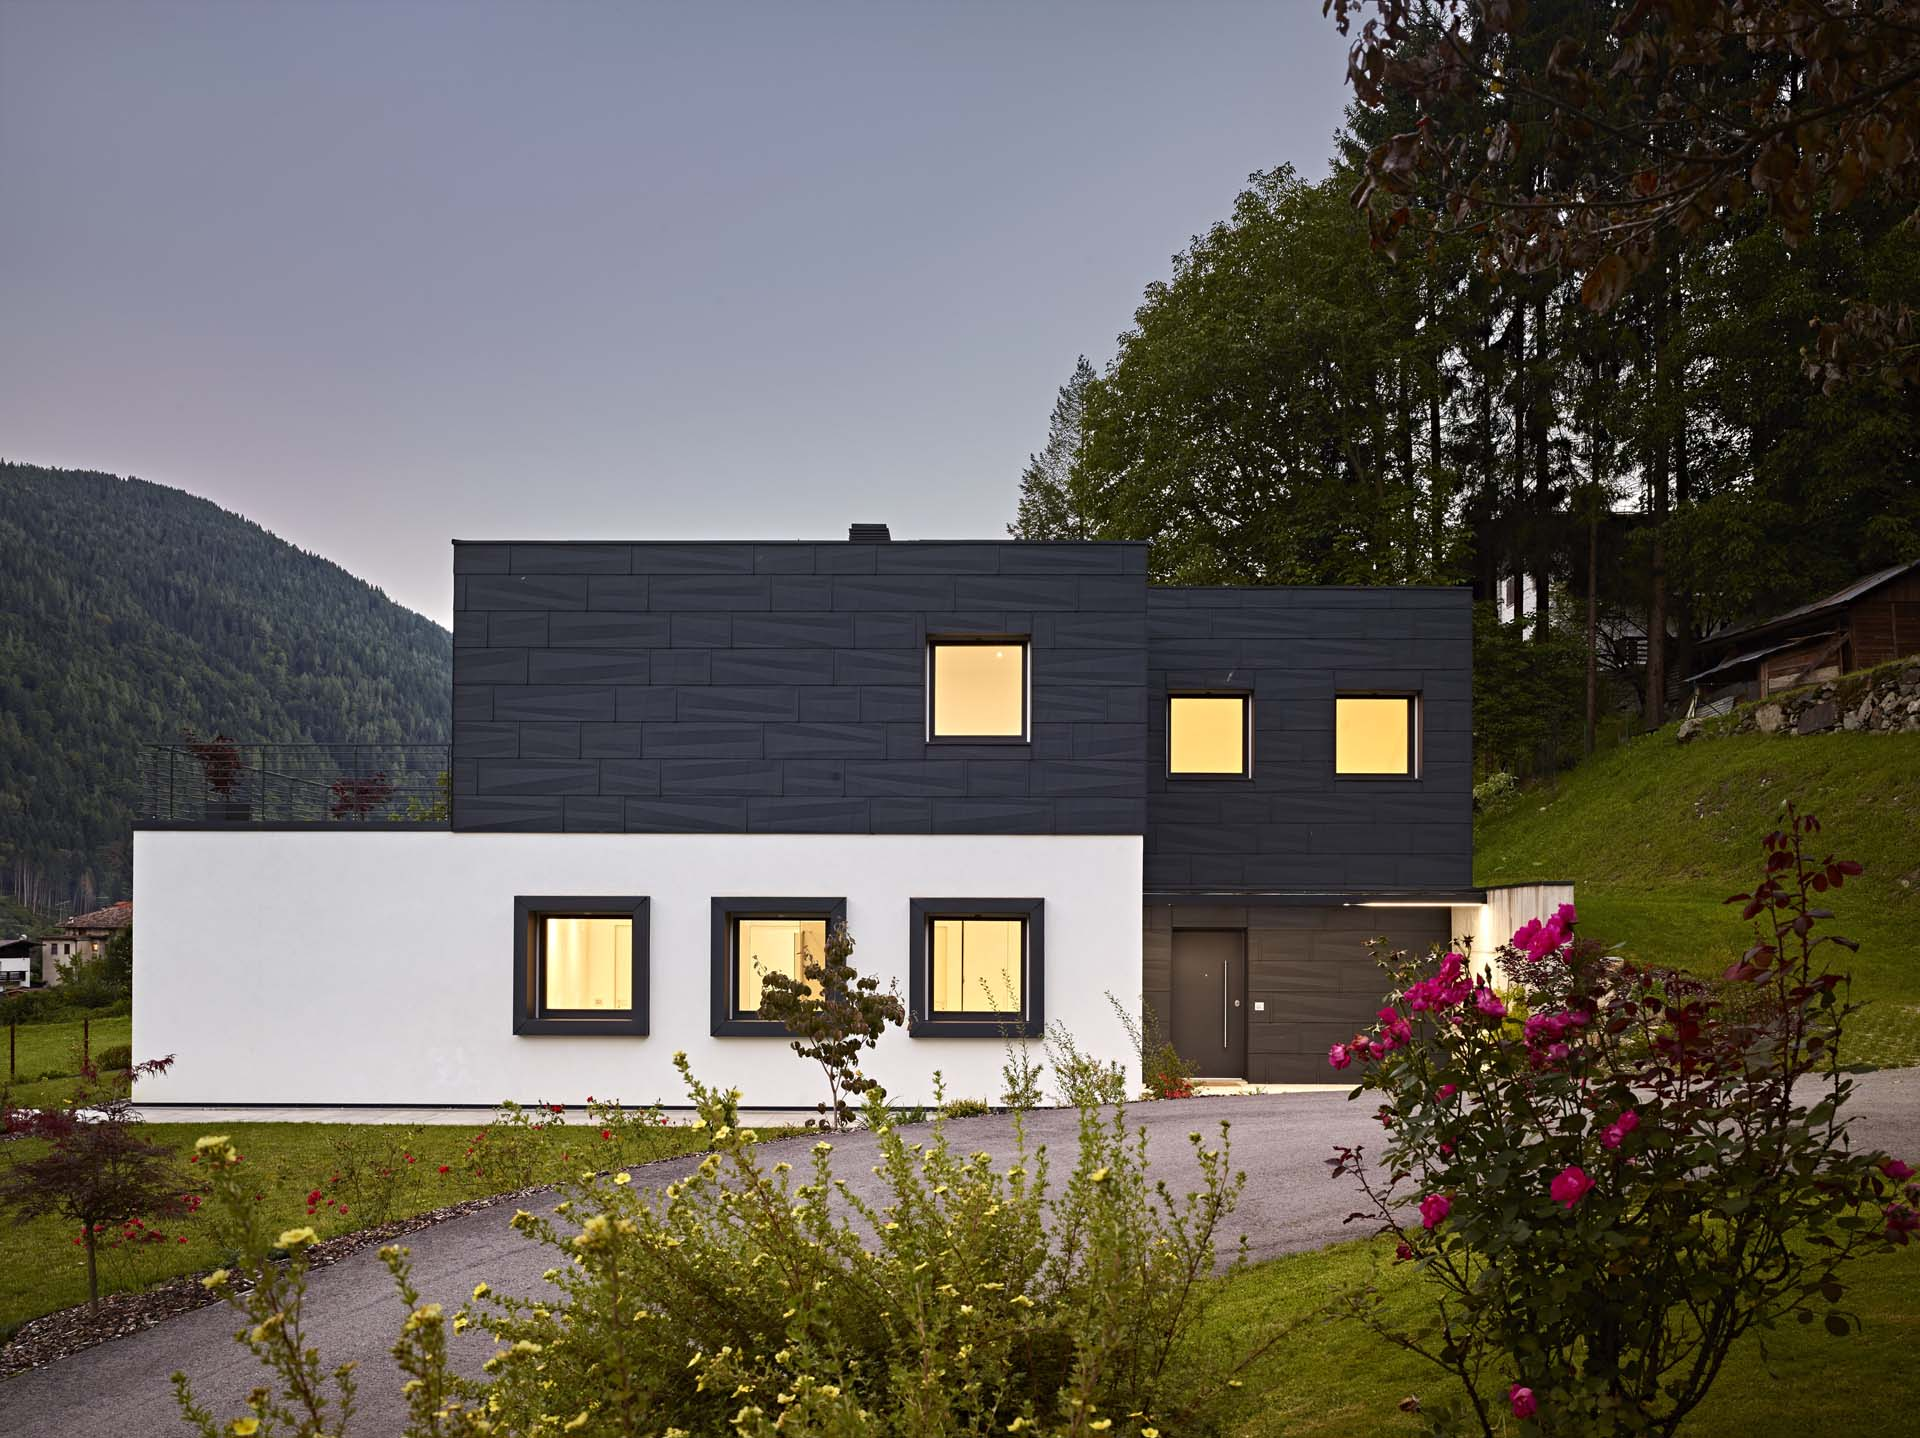 Livelli di certificazione energetica CasaClima edifici in legno